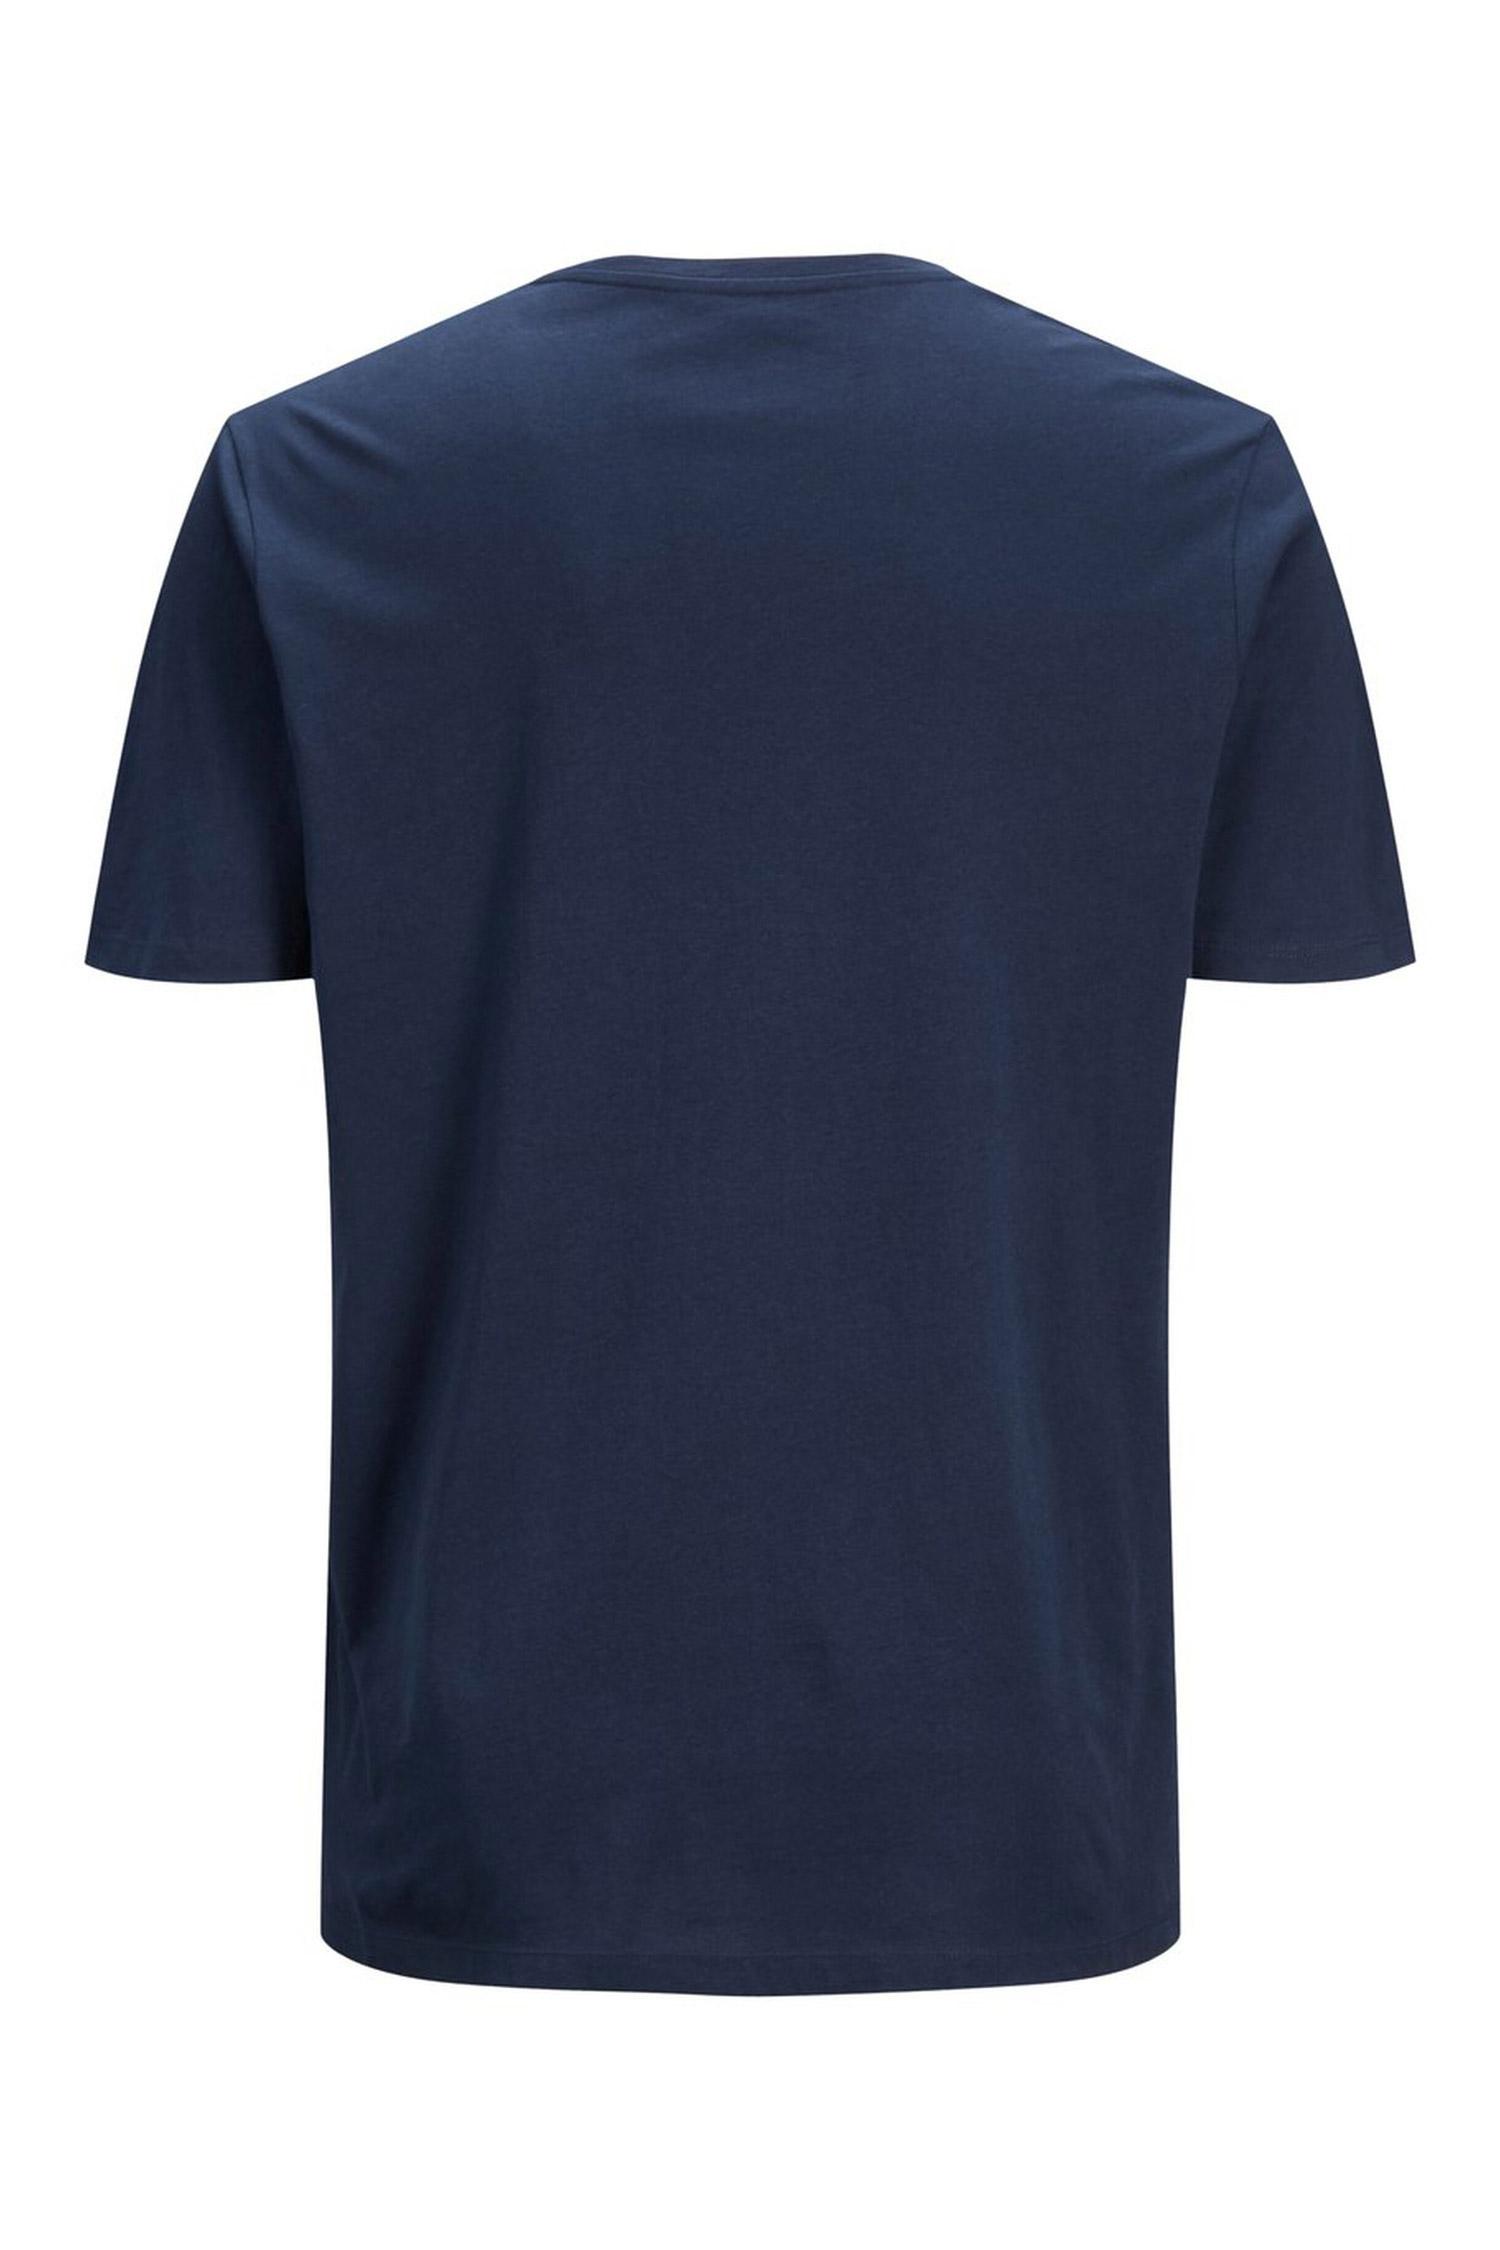 Sport, Camisetas M. Corta, 110113, MARINO   Zoom